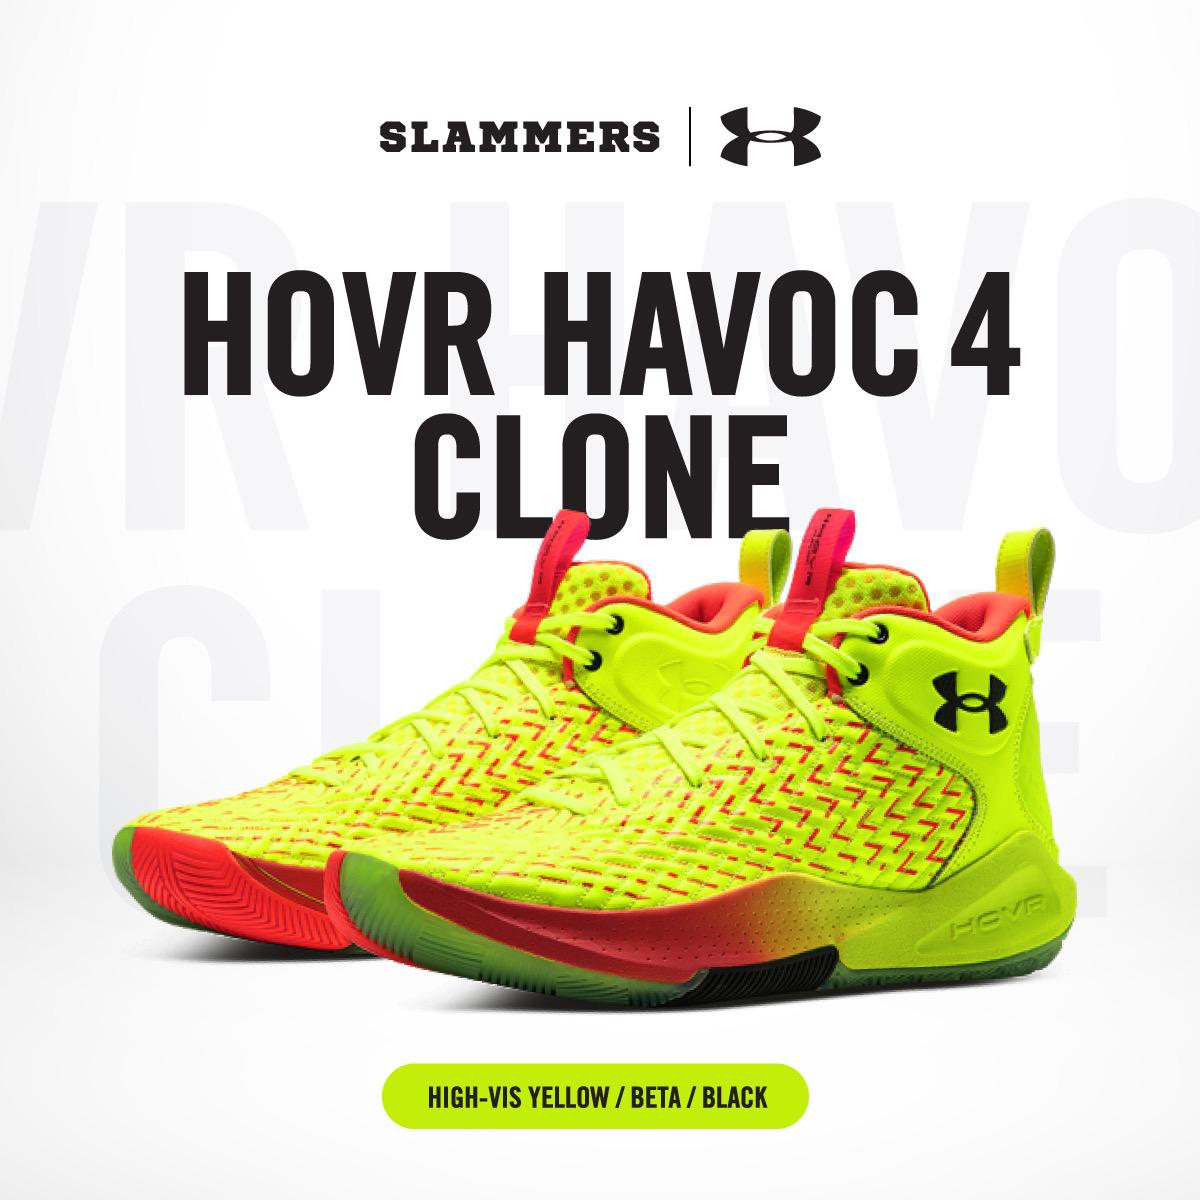 HOVR HAVOC 4 CLONE